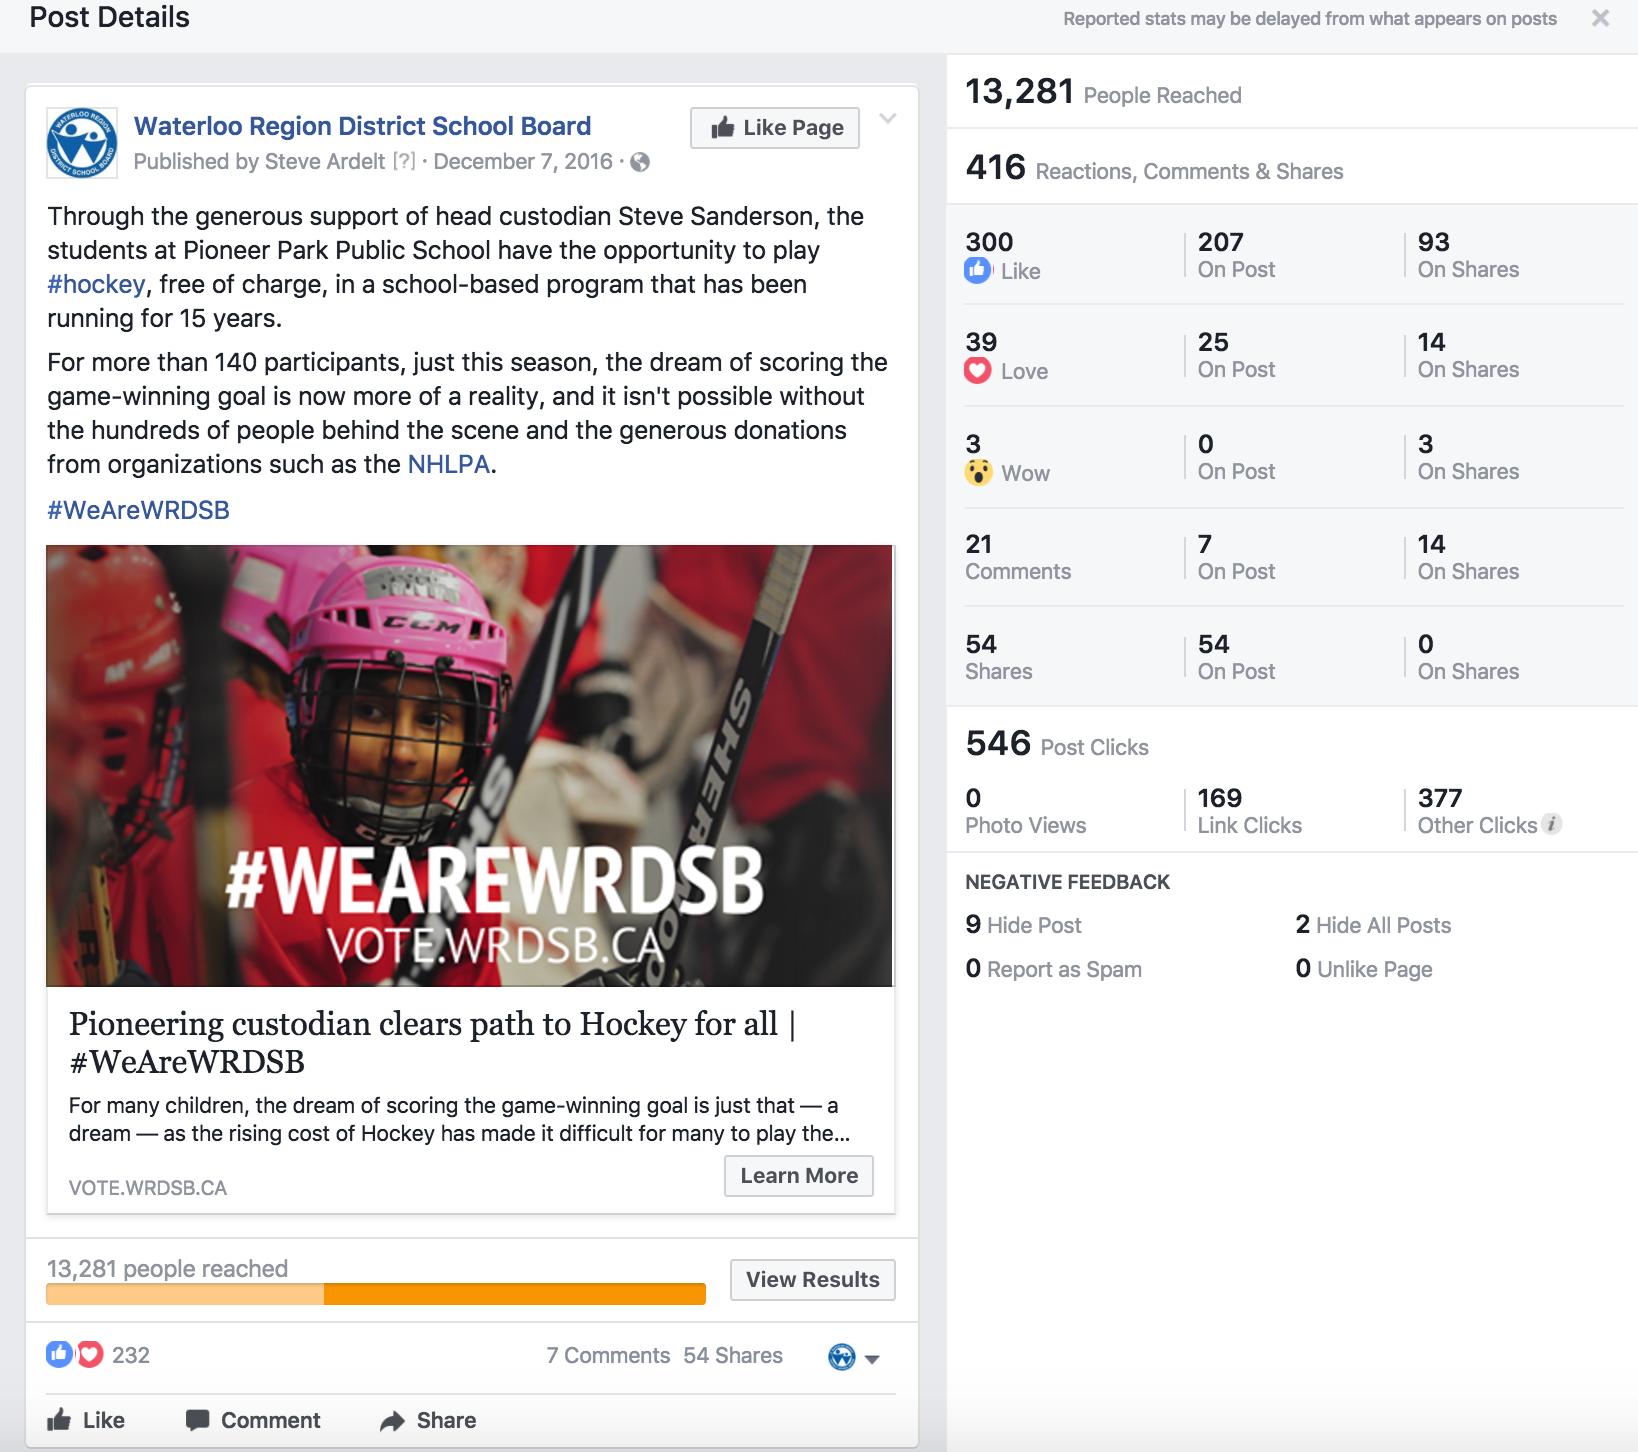 #WeAreWRDSB Facebook Data